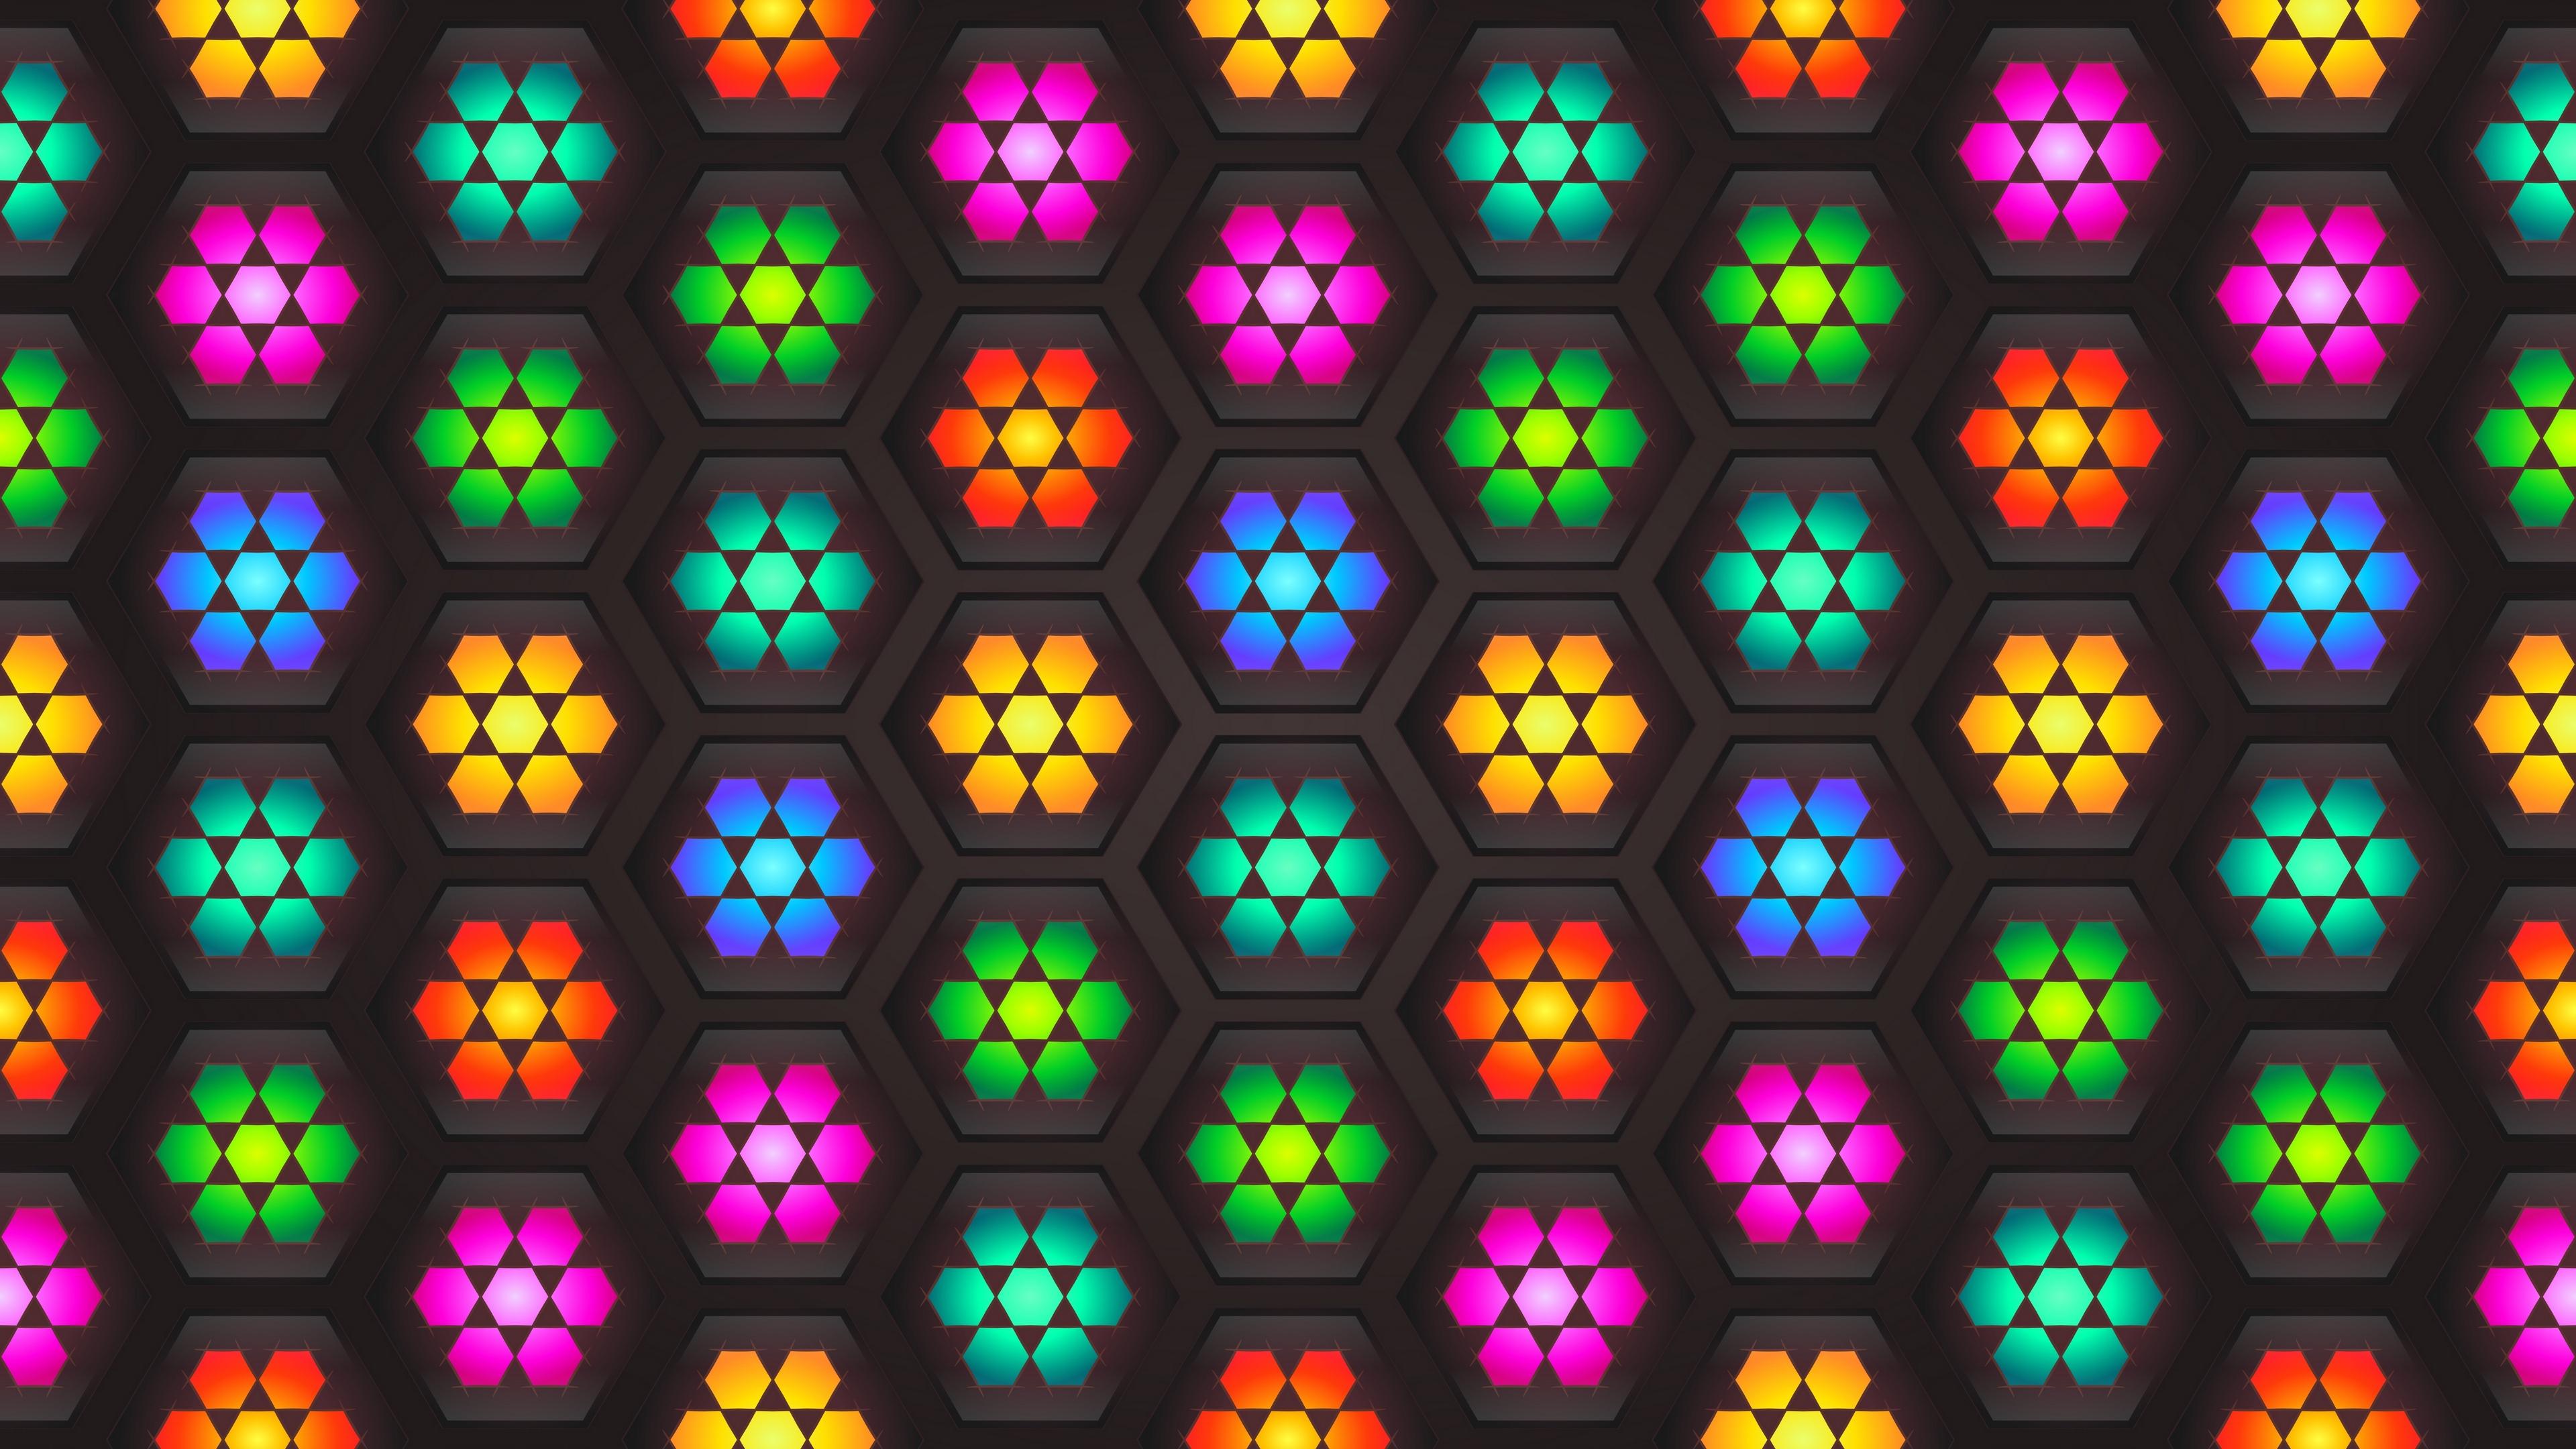 kaleidoscope mosaic patterns colorful 4k 1536097799 - kaleidoscope, mosaic, patterns, colorful 4k - patterns, Mosaic, kaleidoscope